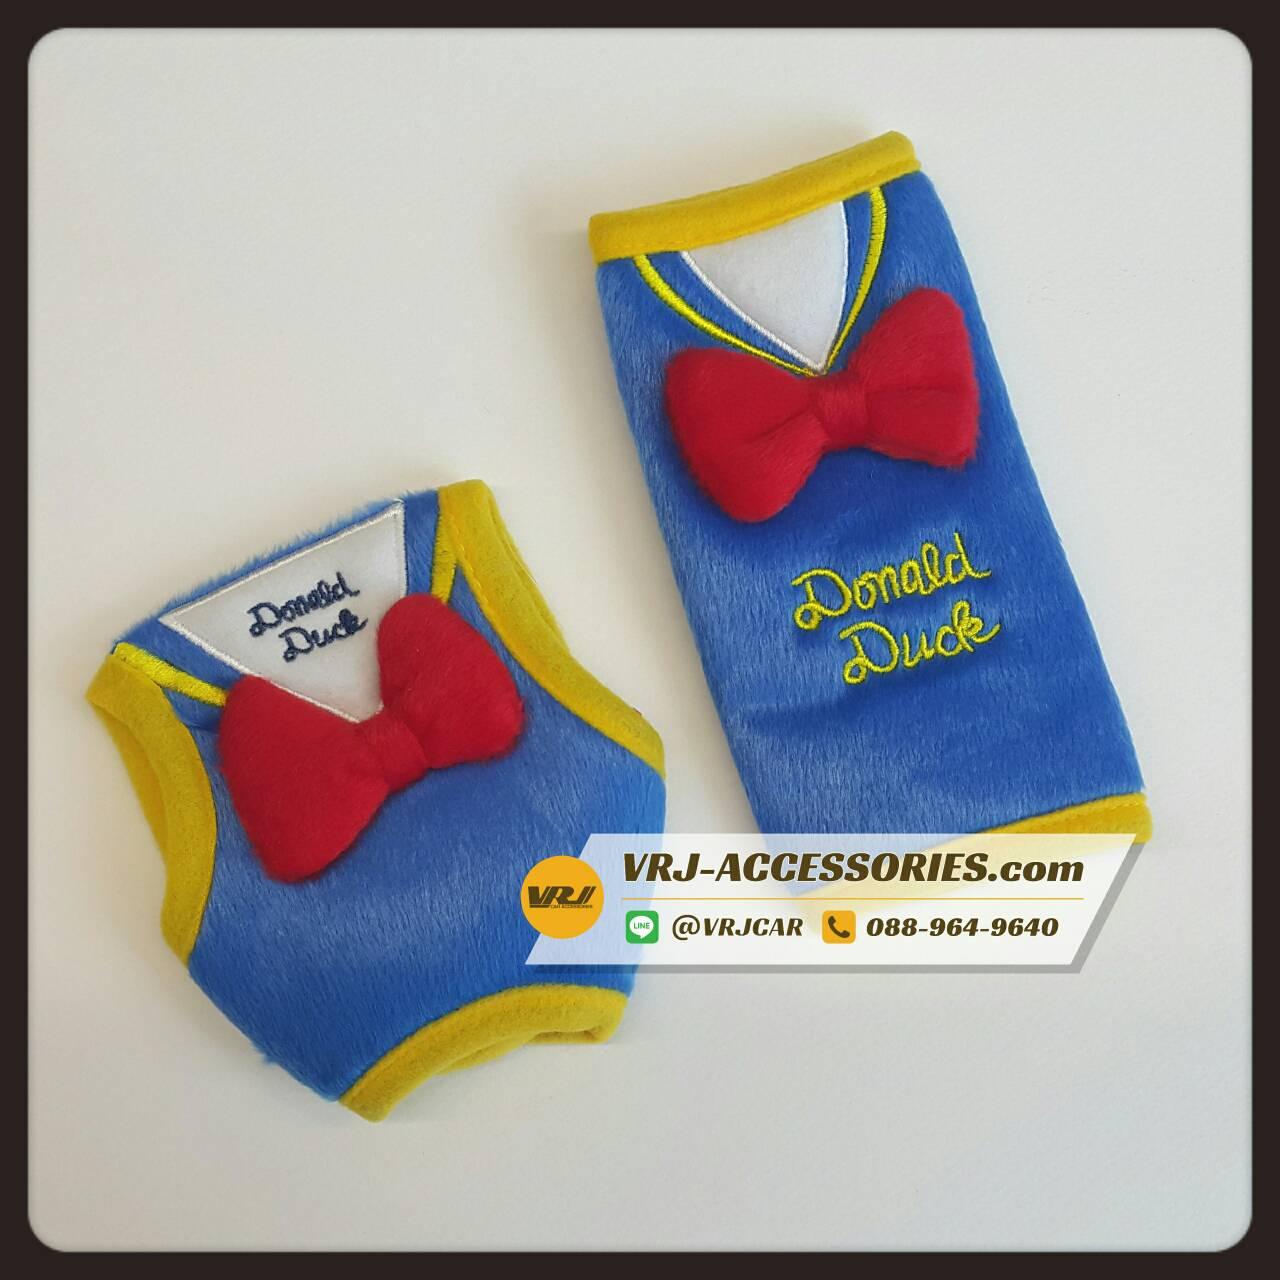 Donald Duck ชุดเซตหุ้มเกียร์ ออโต้ และ หุ้มเบรคมือ โดนัลดั๊ก Knob cover and Hand brake cover